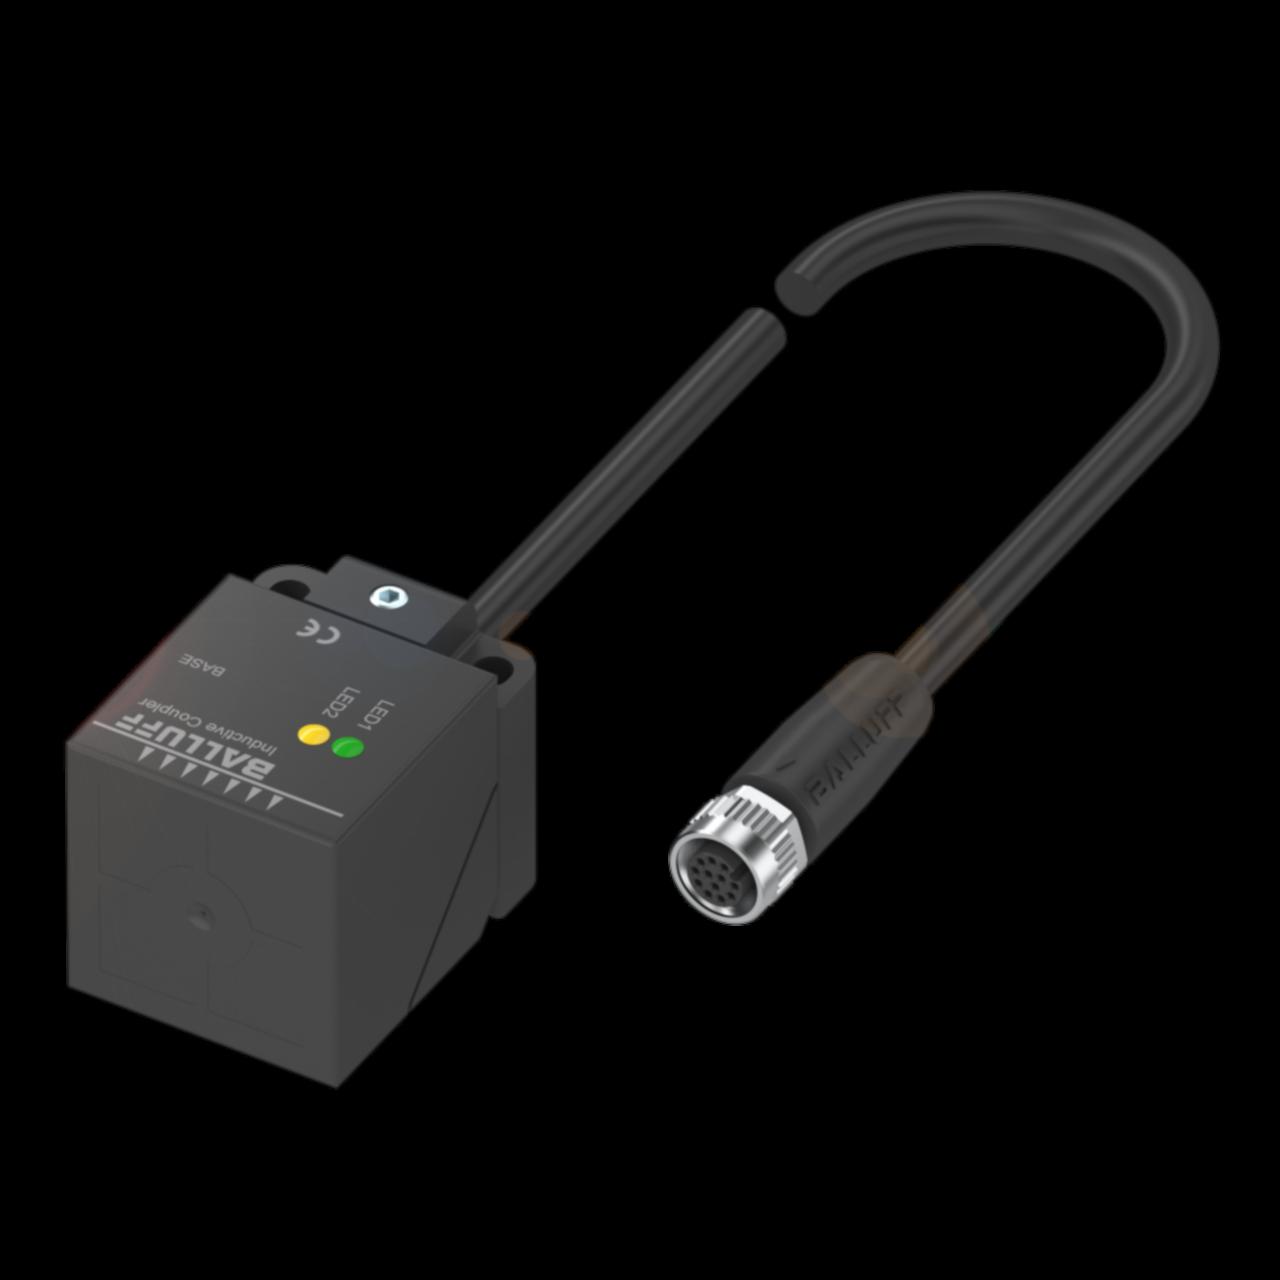 BIC 2I3-P2A50-Q40KFU-EPX0-002-M4CA